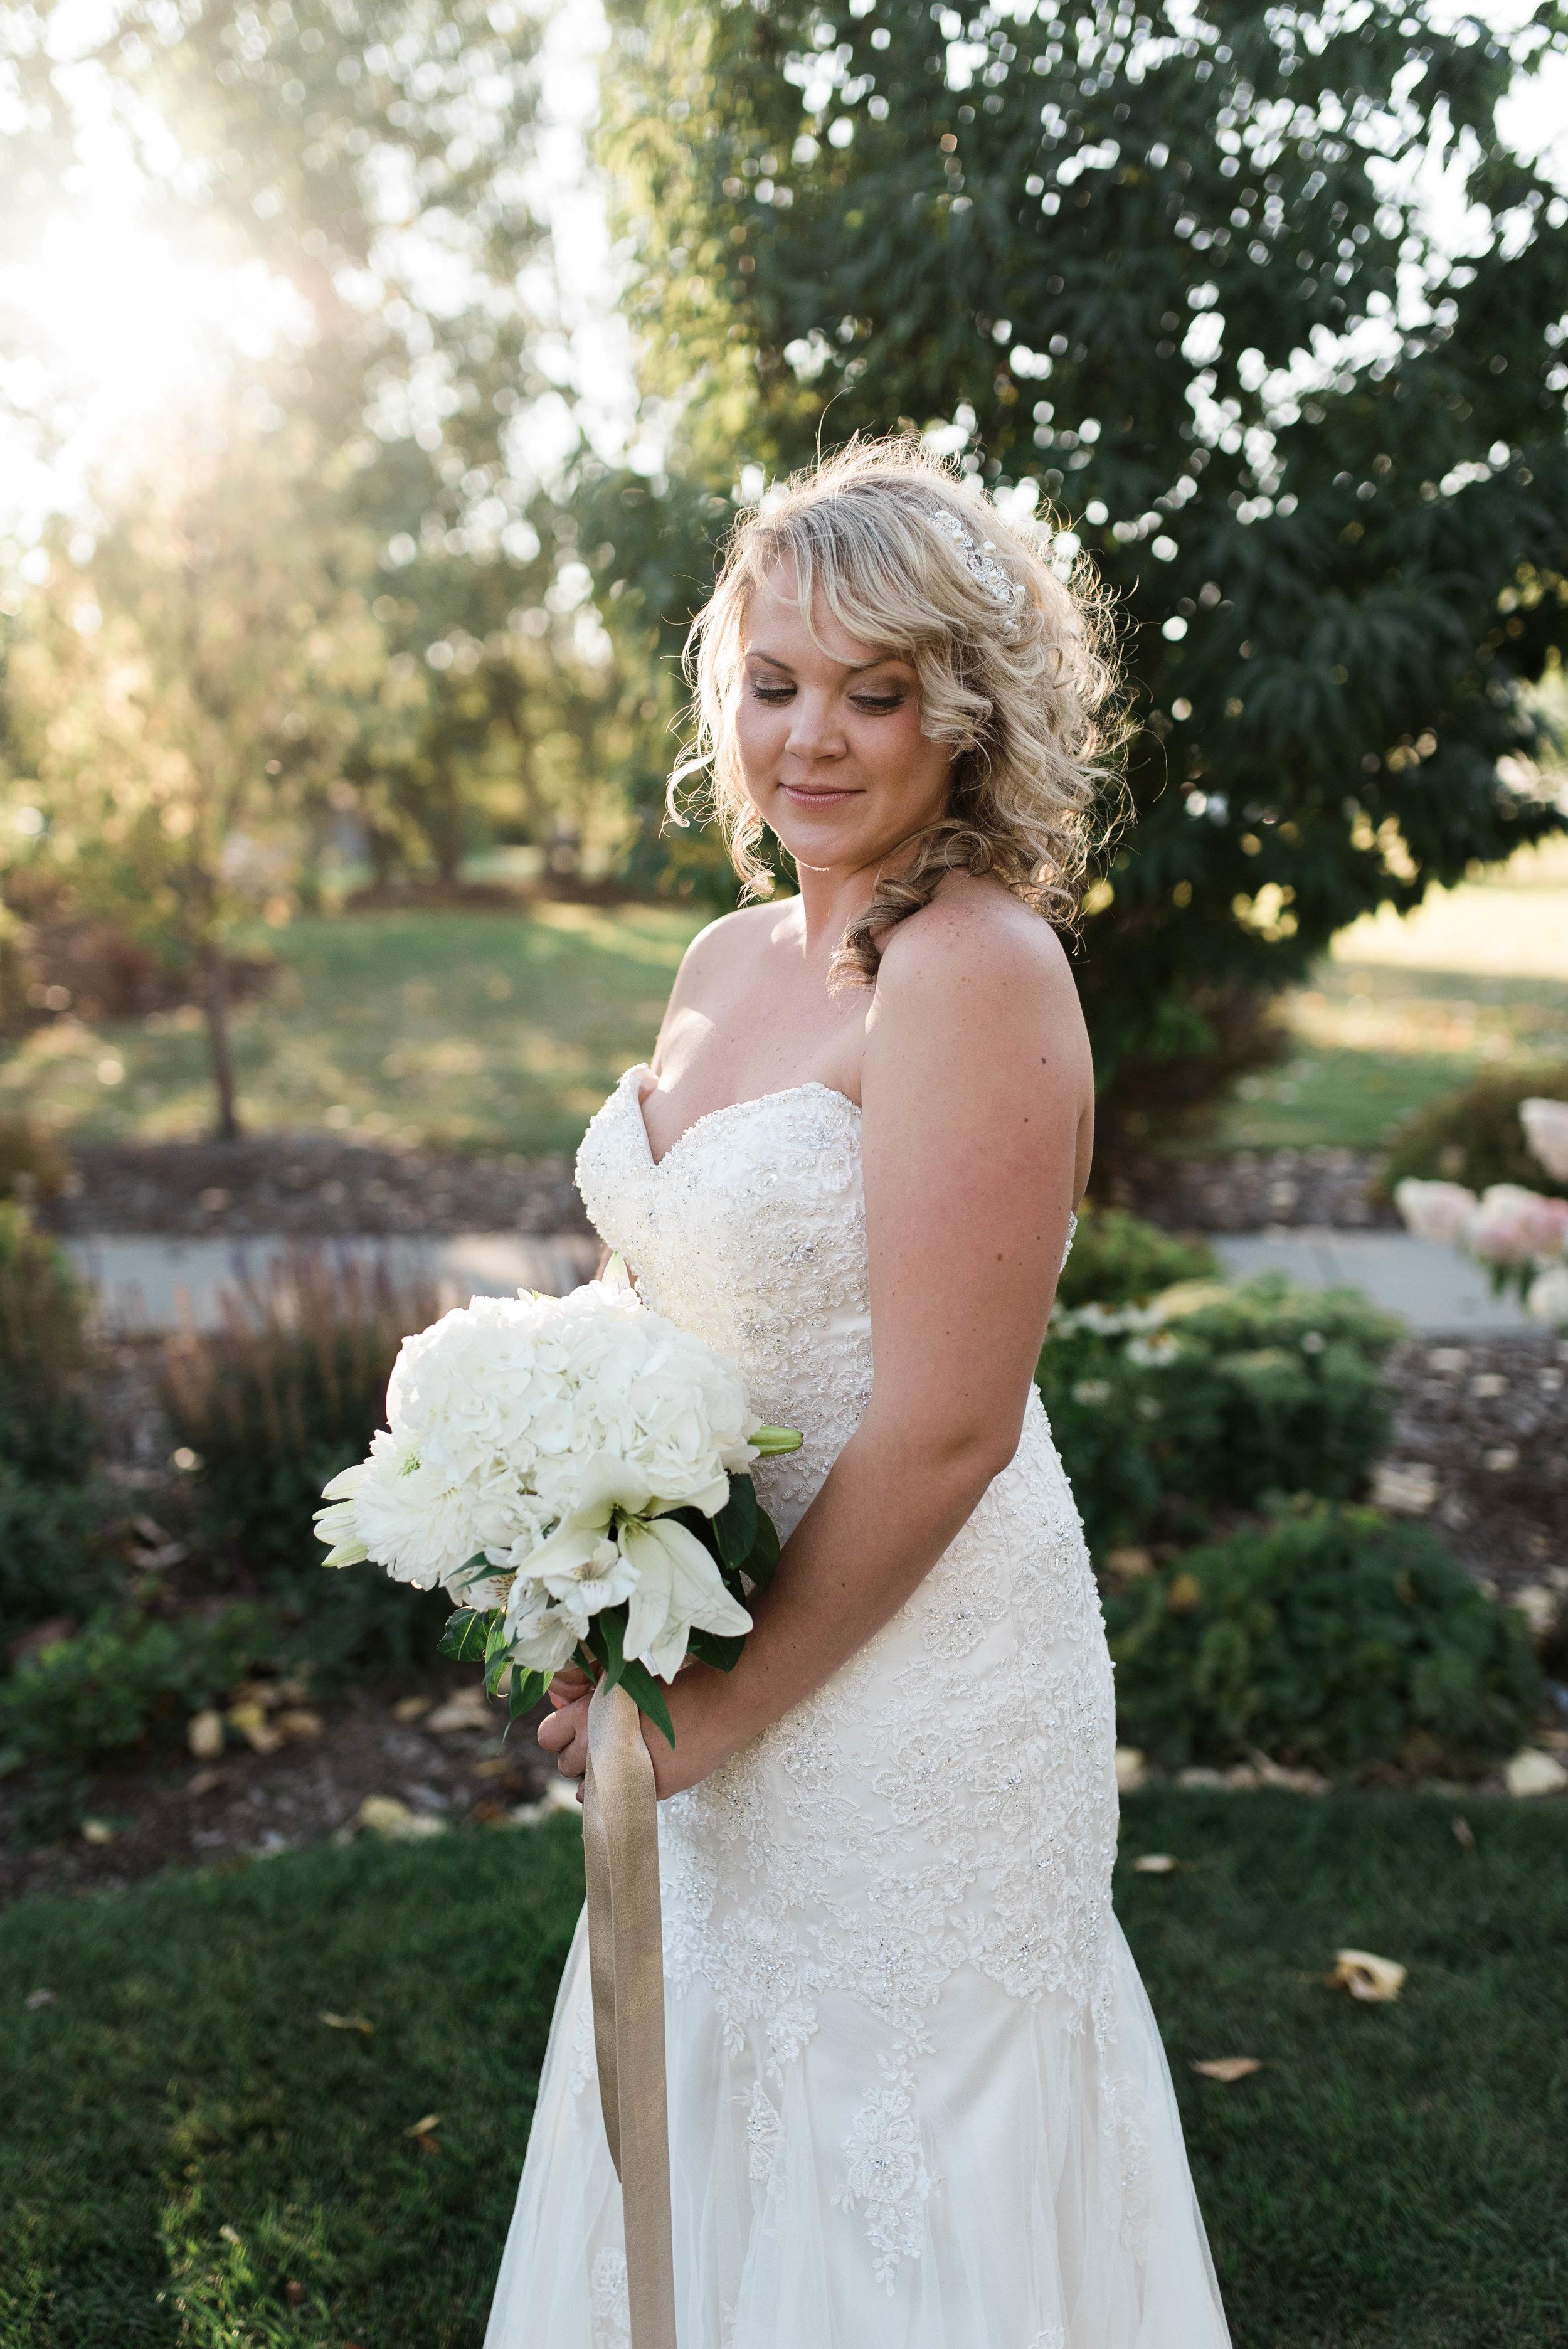 Ipsen Wedding 079-Edit.jpg